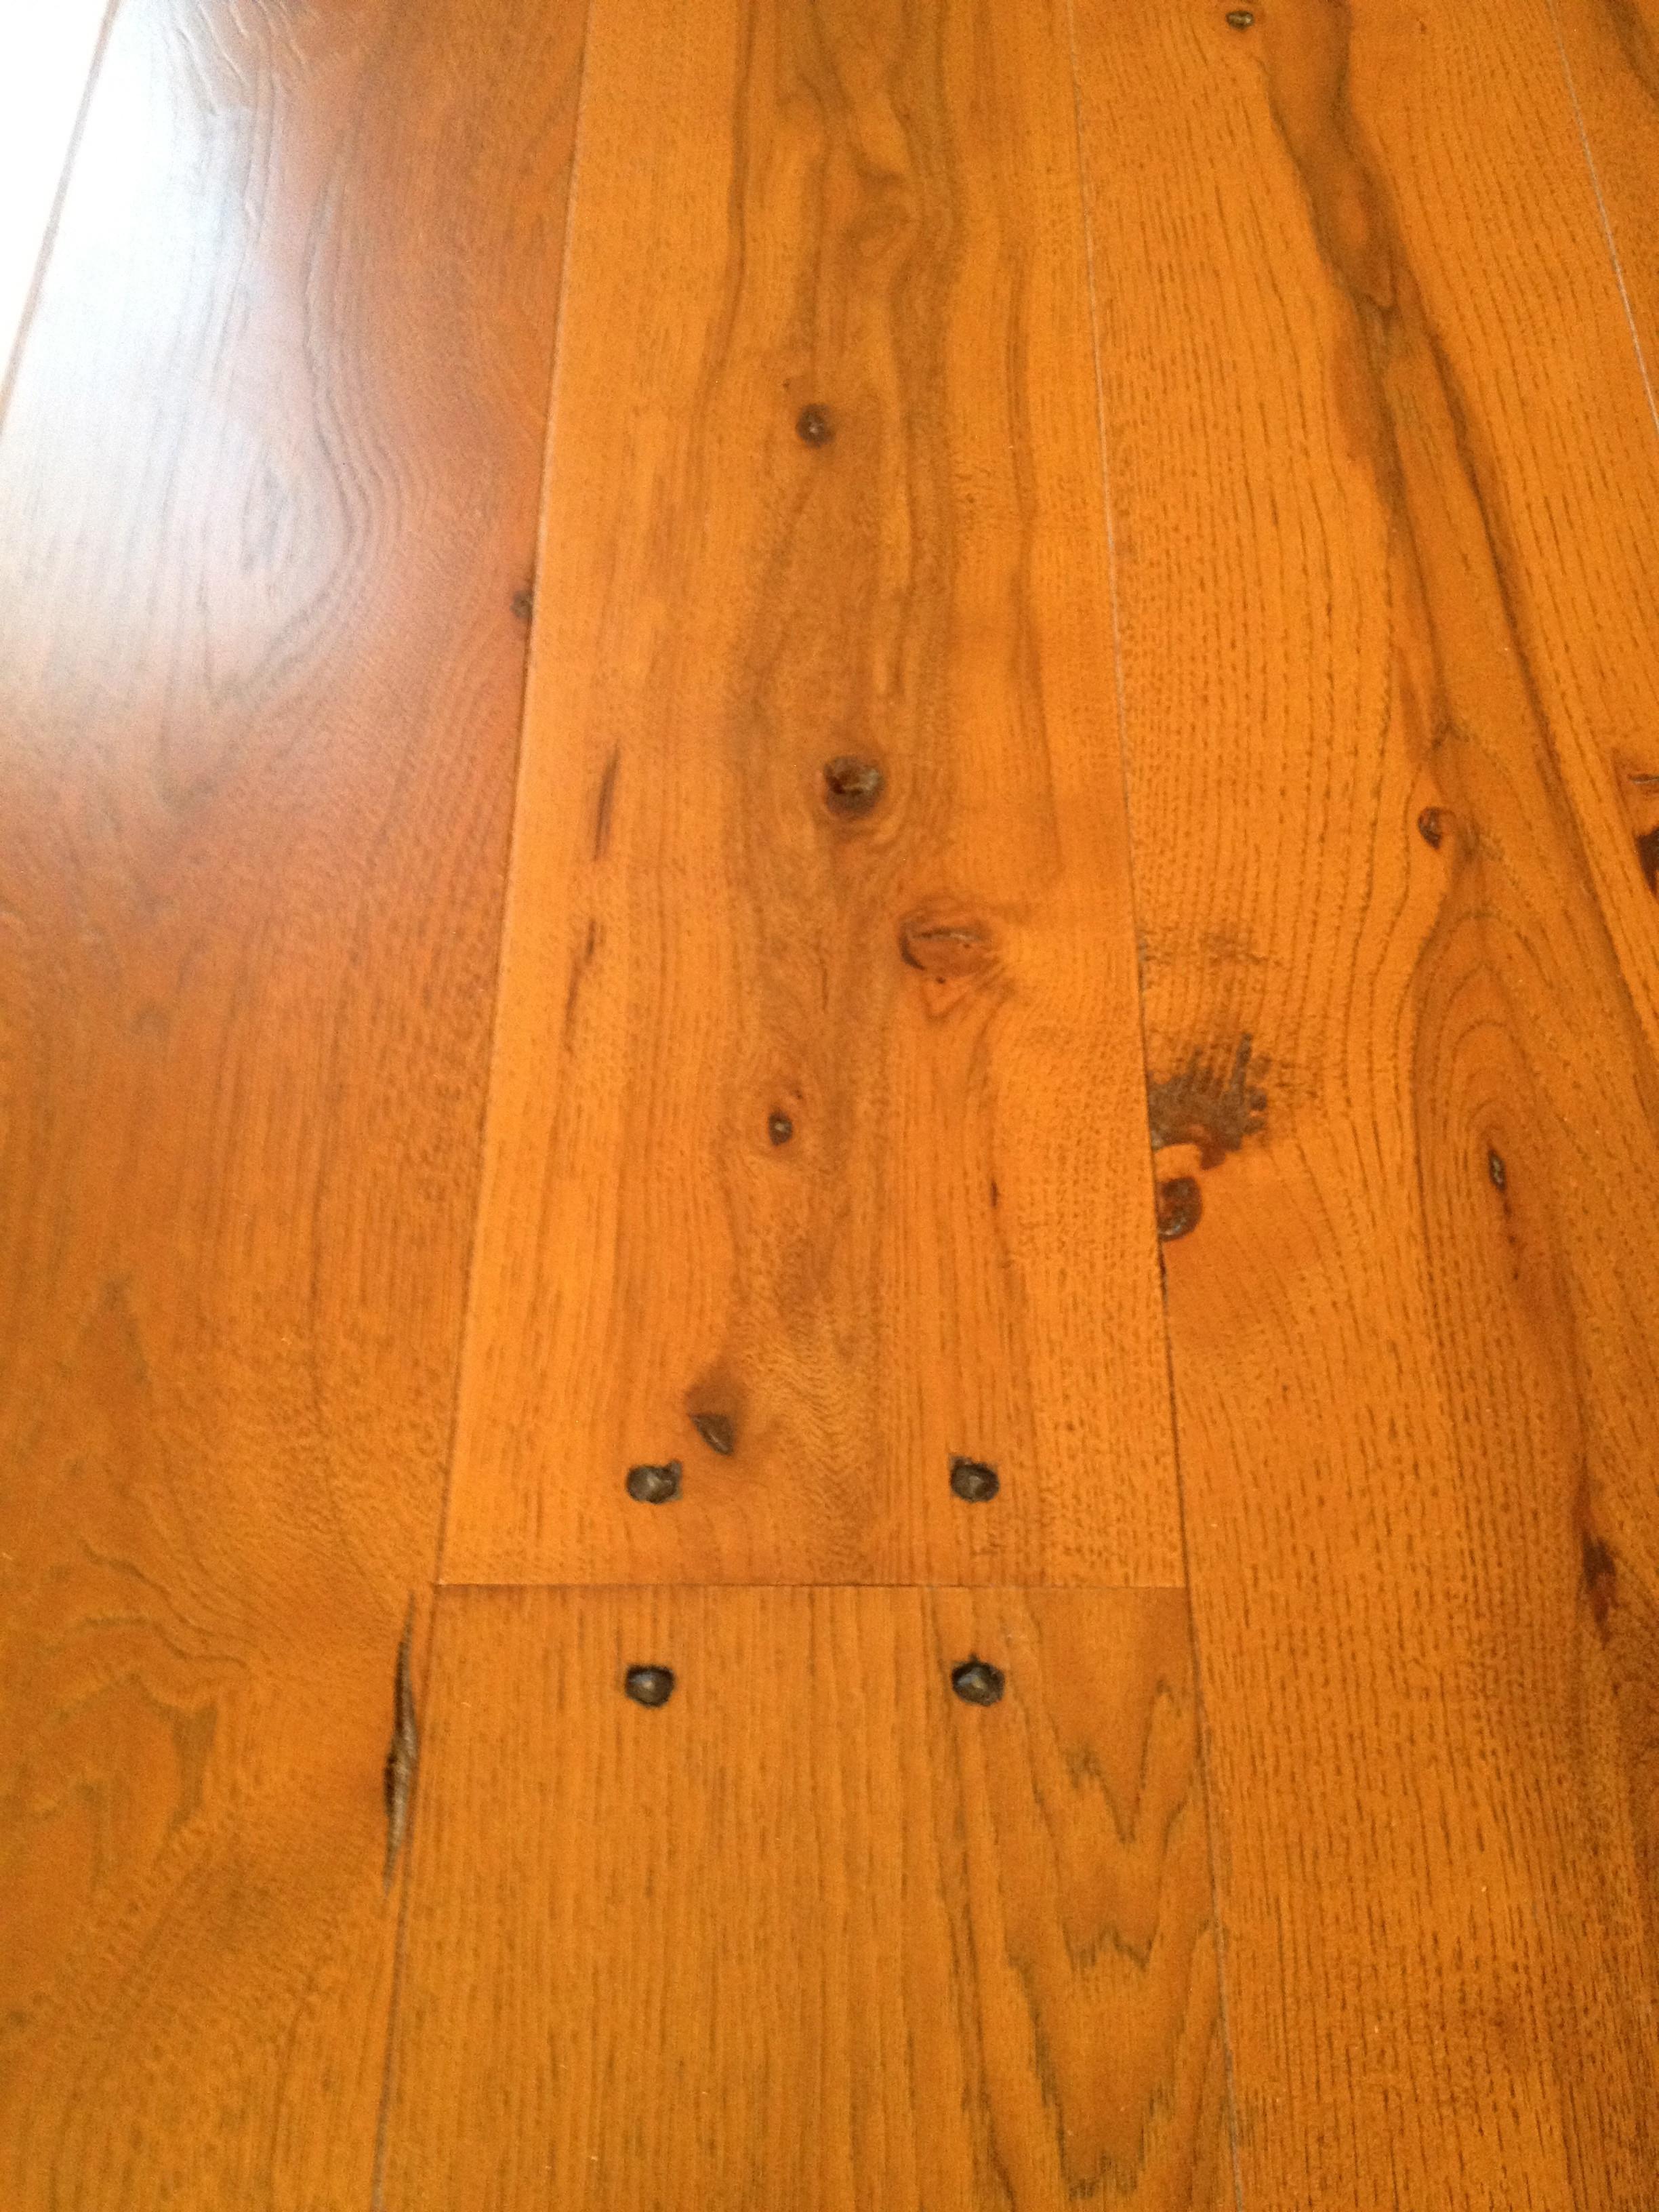 hardwood floor installation monmouth county nj of flooring portfolio gorsegner brothers in img 0322